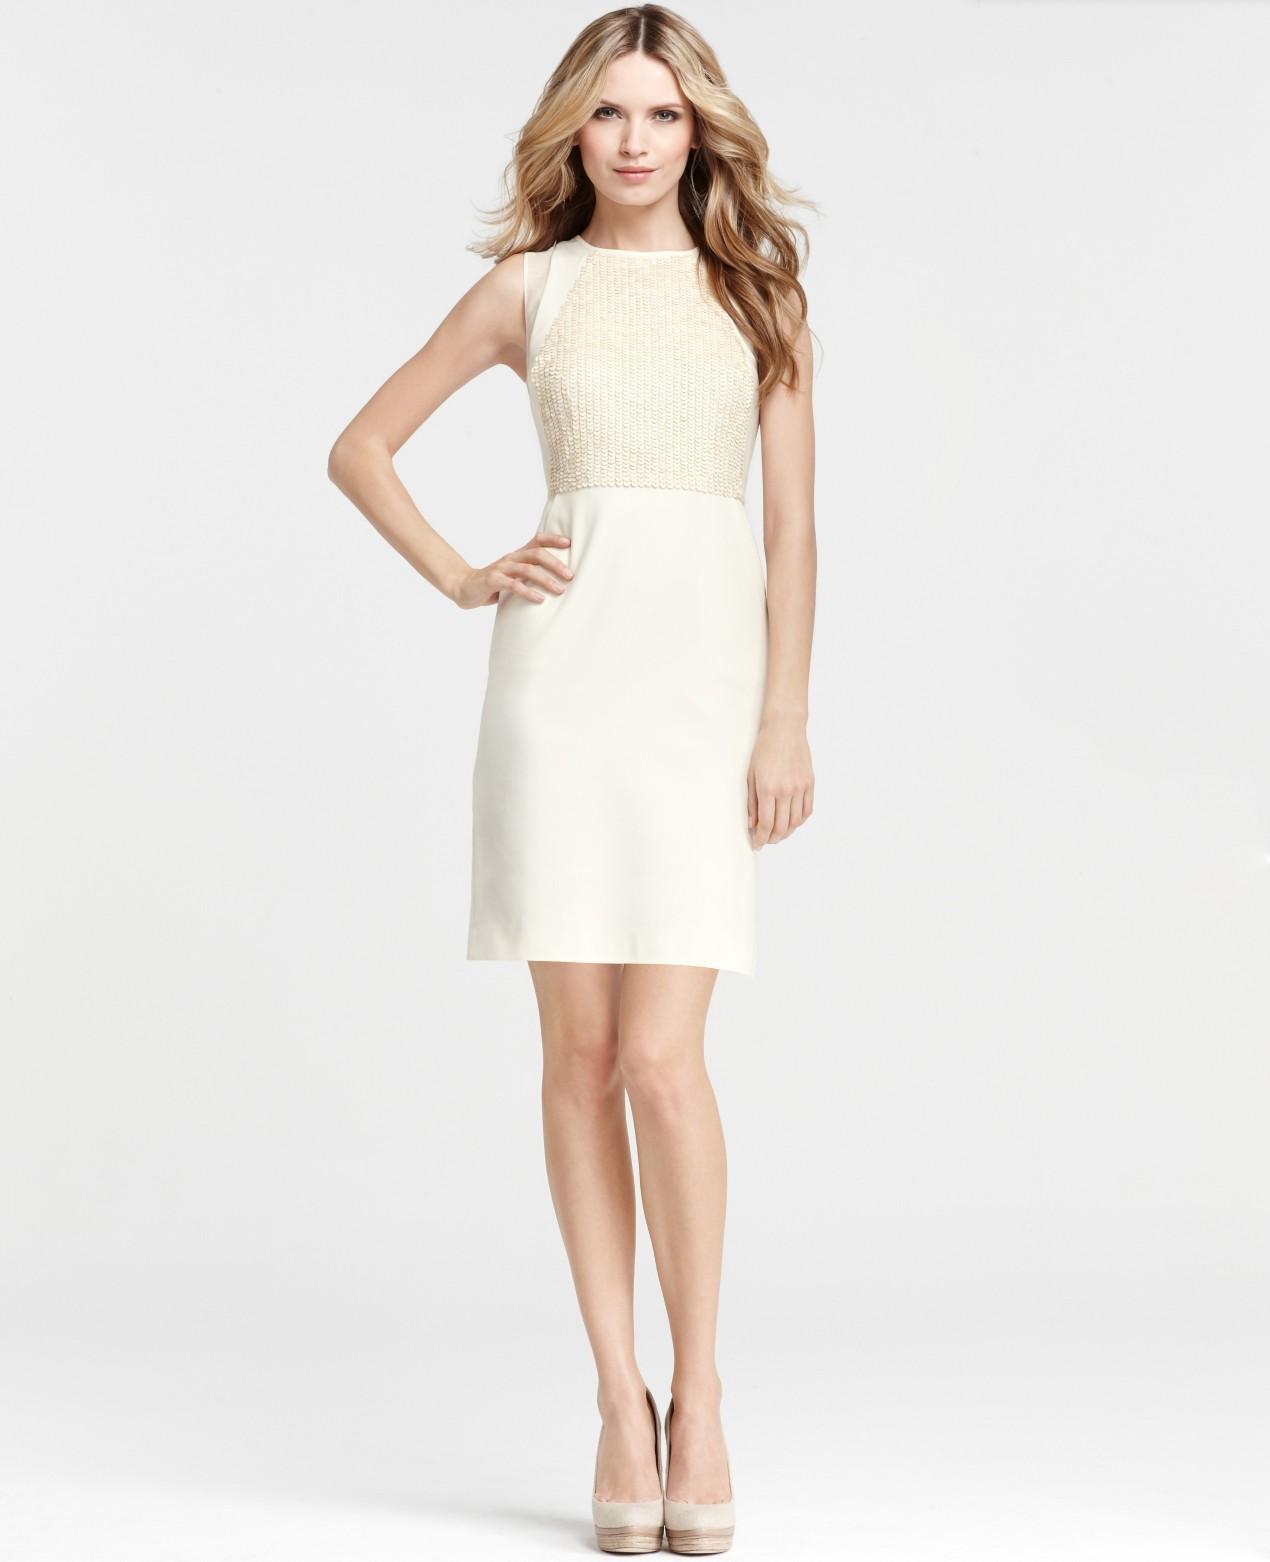 Lyst - Ann Taylor Confetti Dress in Natural